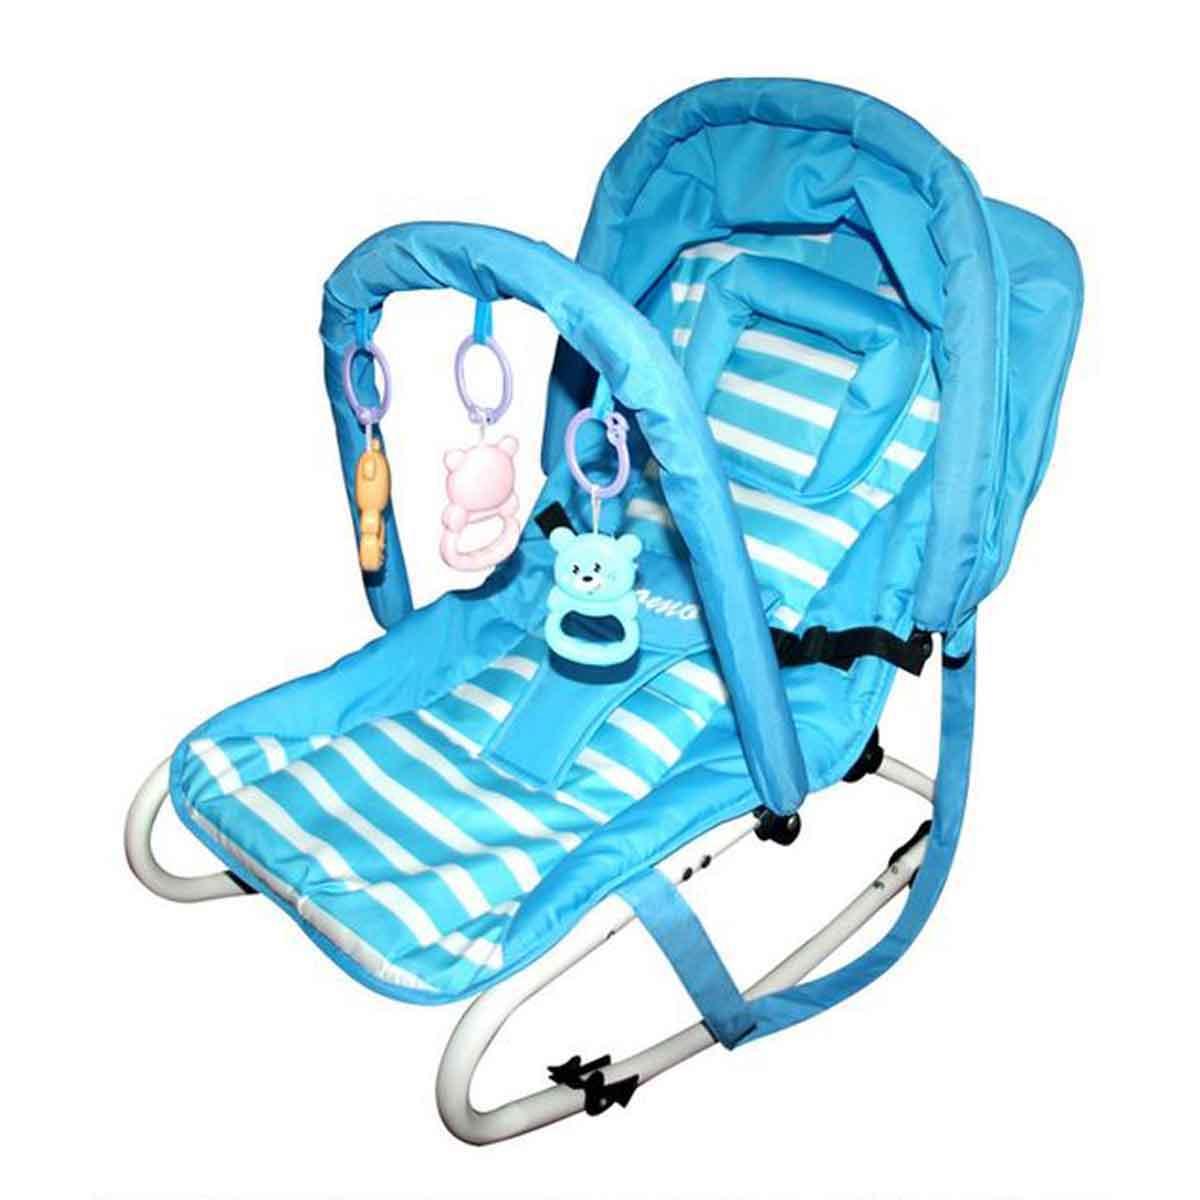 Baby Rocking Chair version